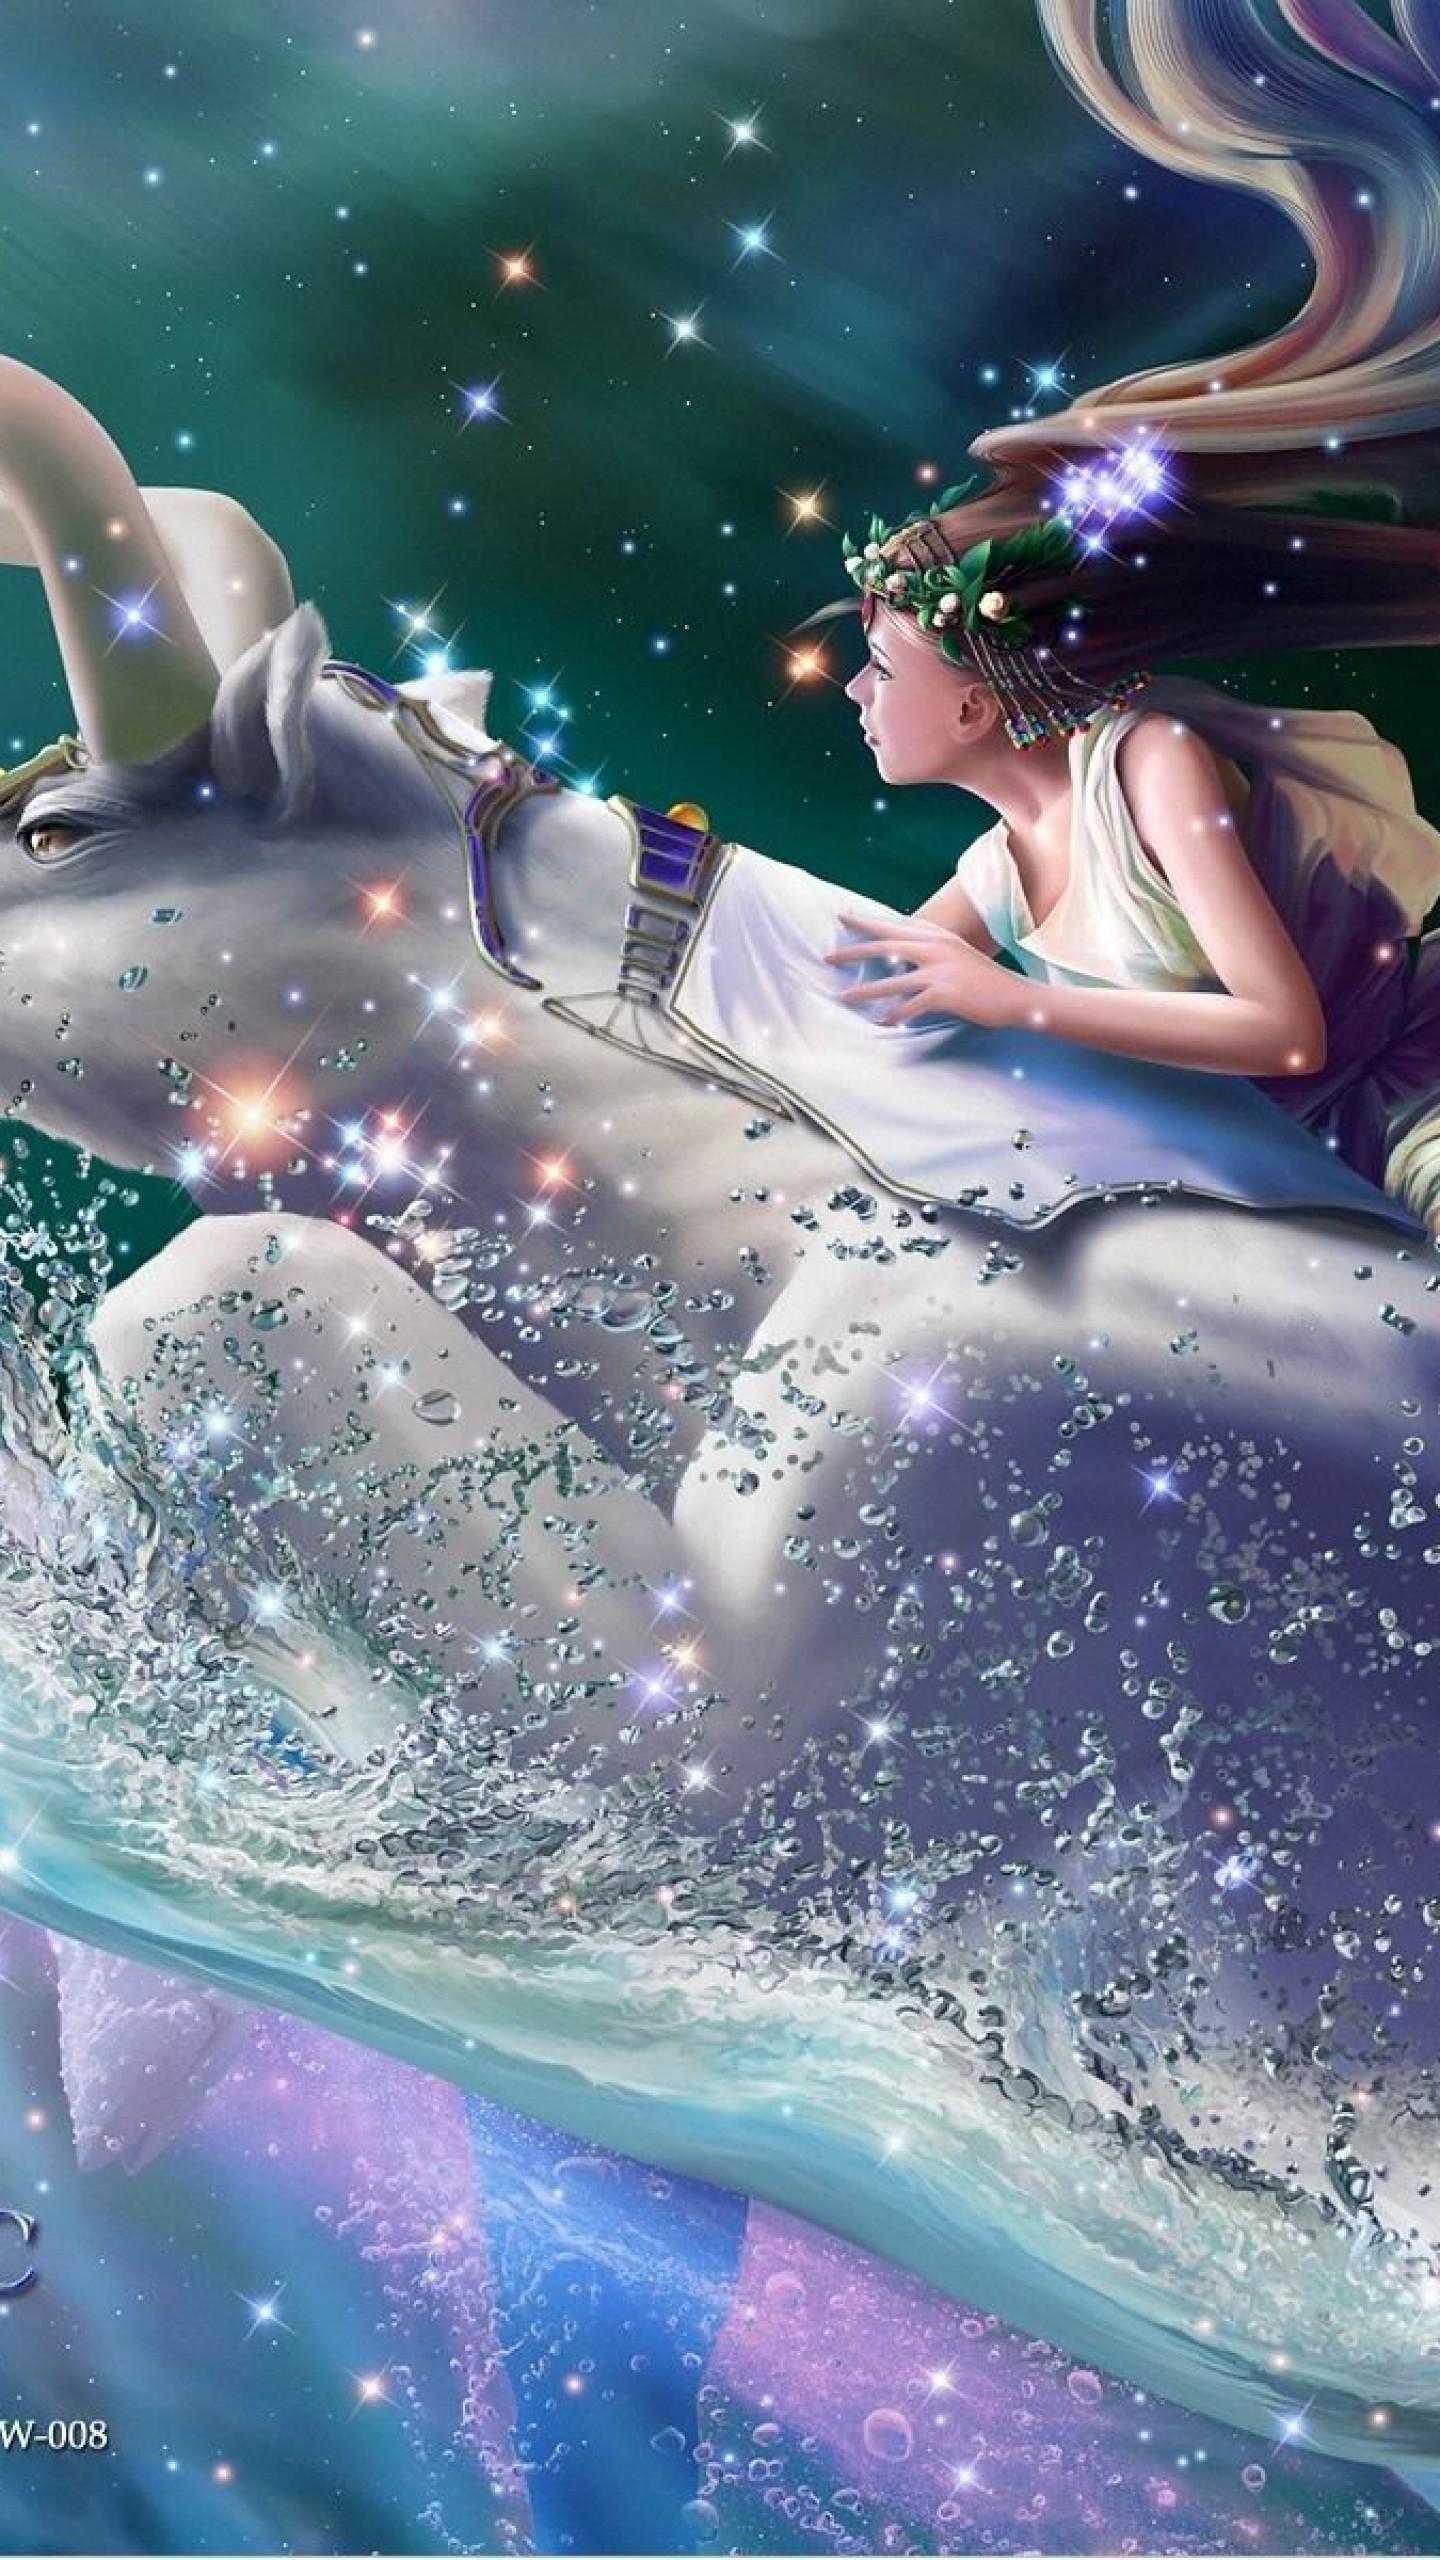 Wallpaper zodiac, signs, little bodies, water, girl